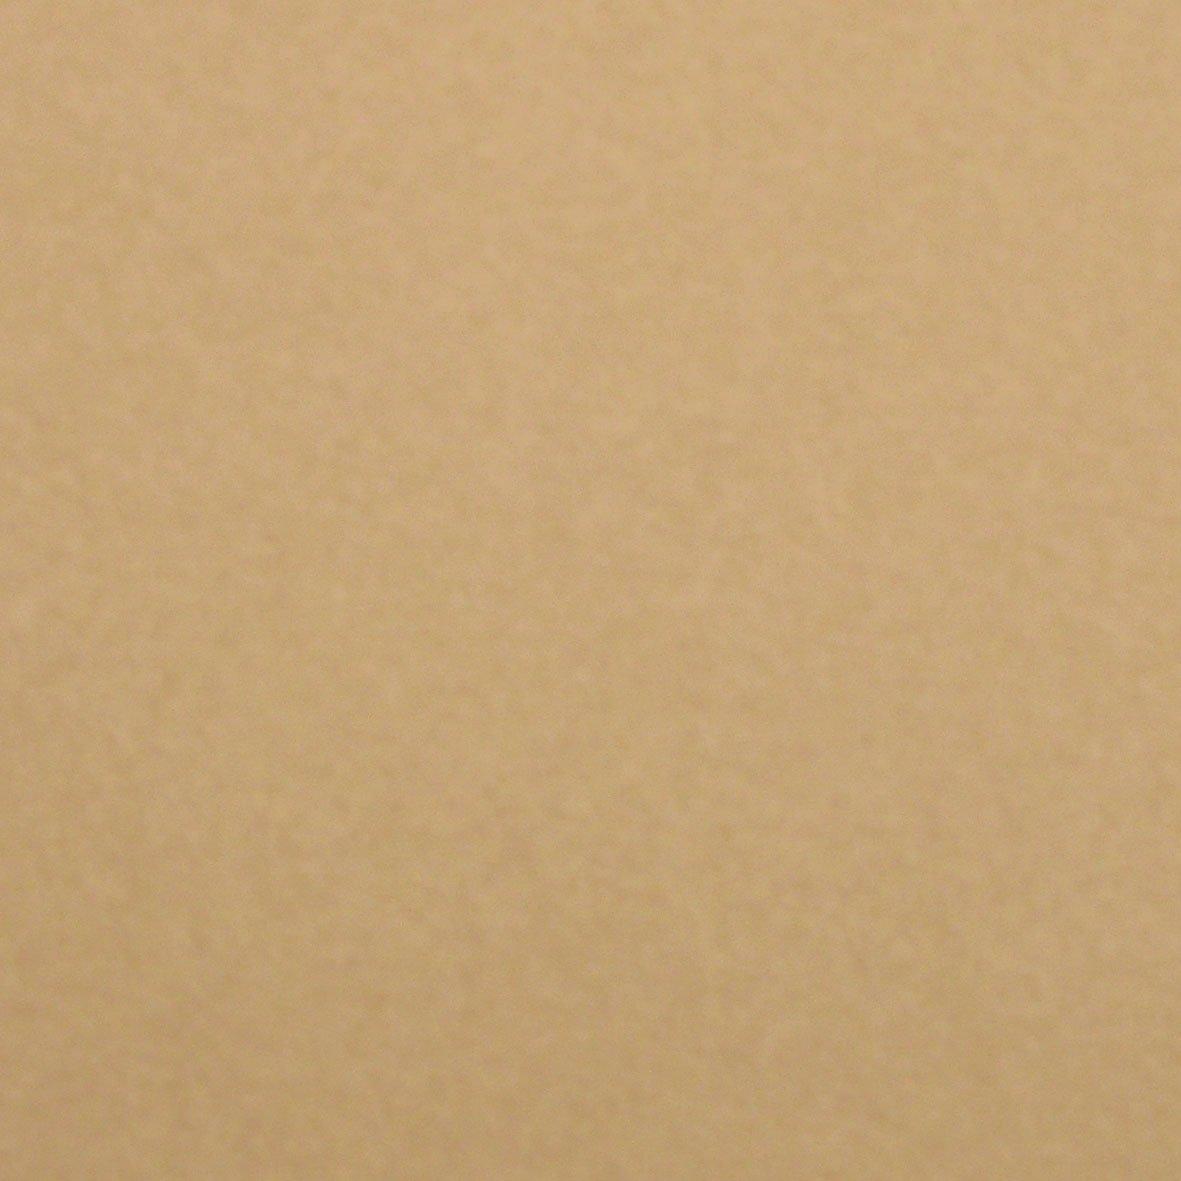 Hahnemuhle Velour Pastel Paper - Sandy Pack of 10 x 1/2 sheets 35x50cm Teaching Art